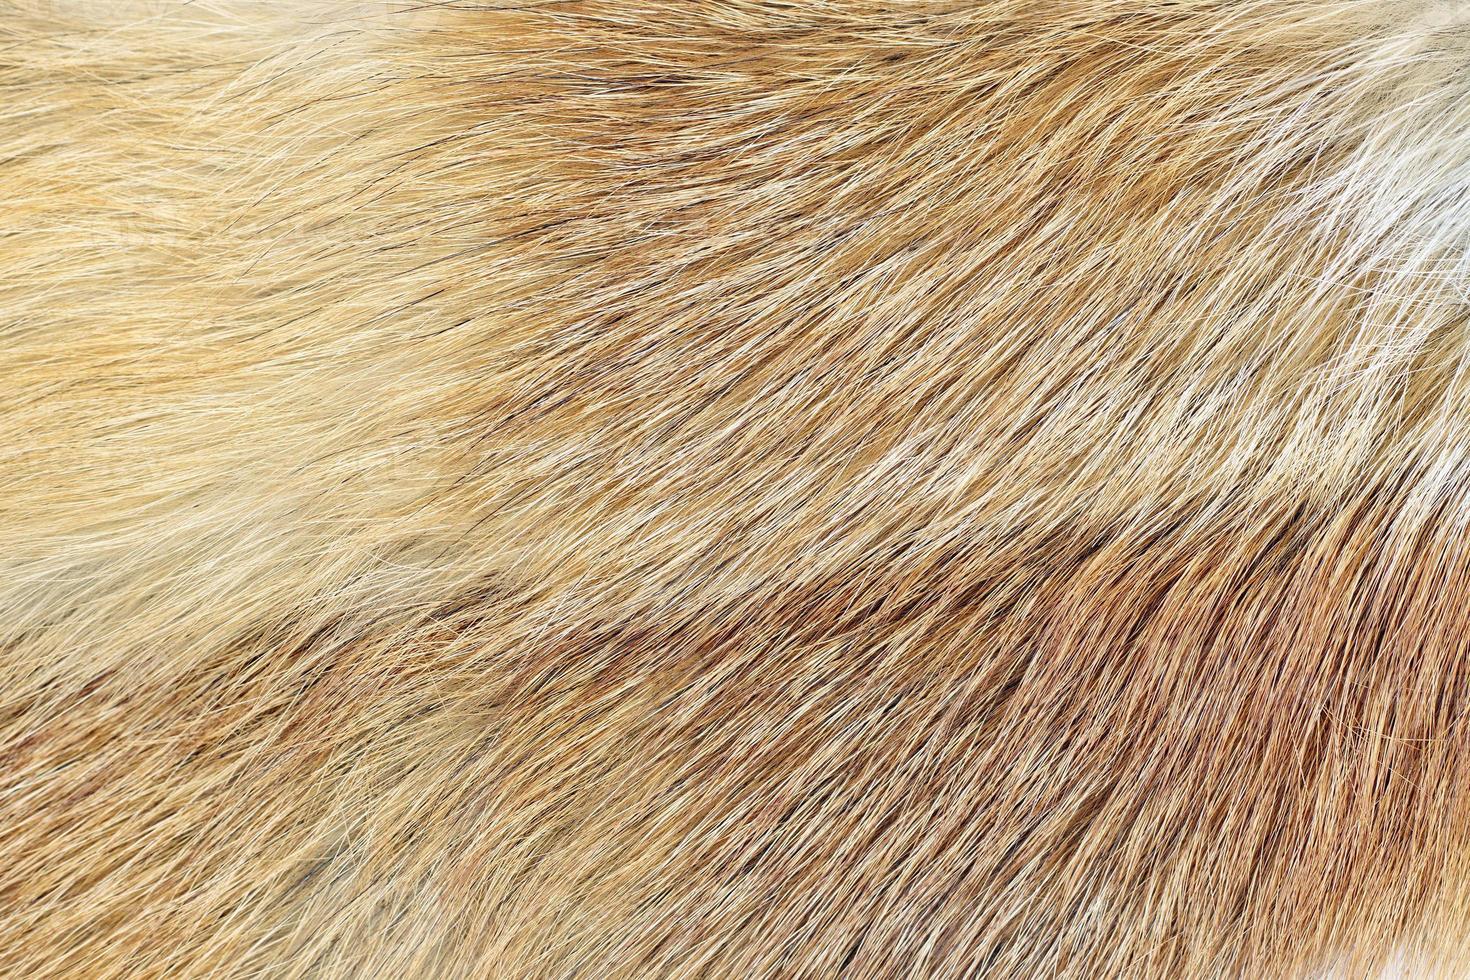 Fondo de piel de zorro rojo (vulpes sp.) foto